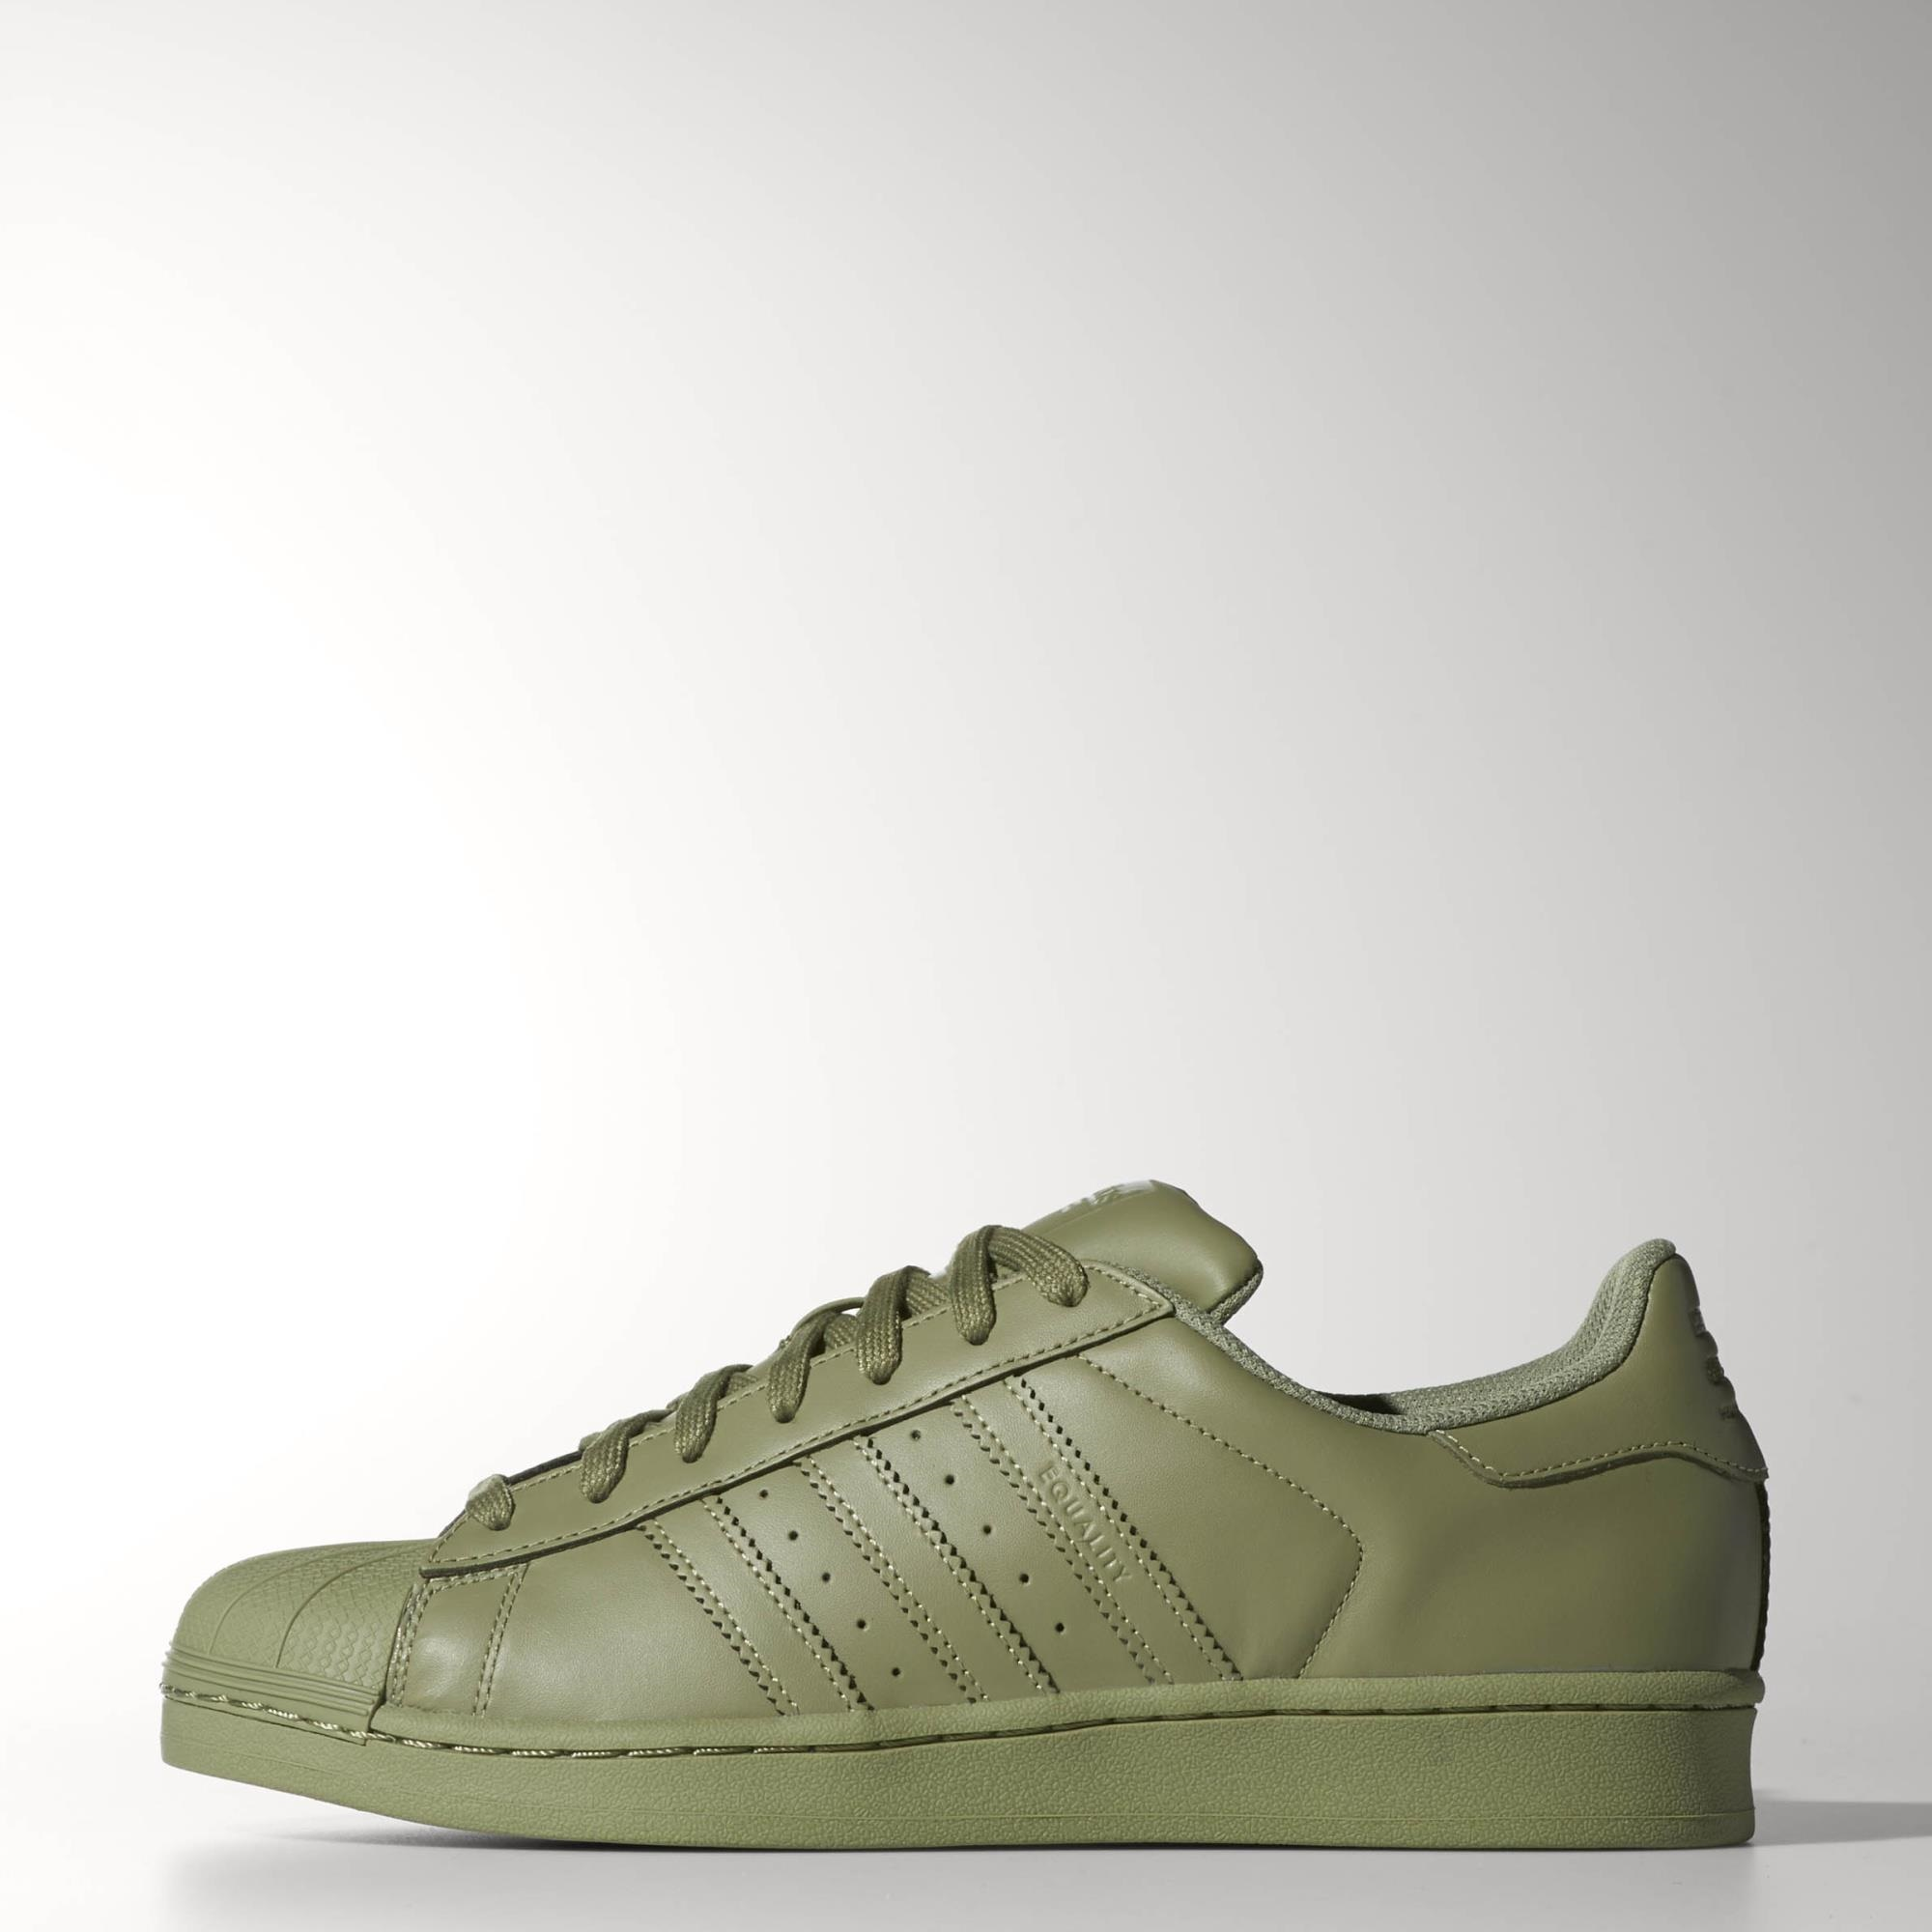 Adidas Originals Men Olive Green Superstar 80S DECON